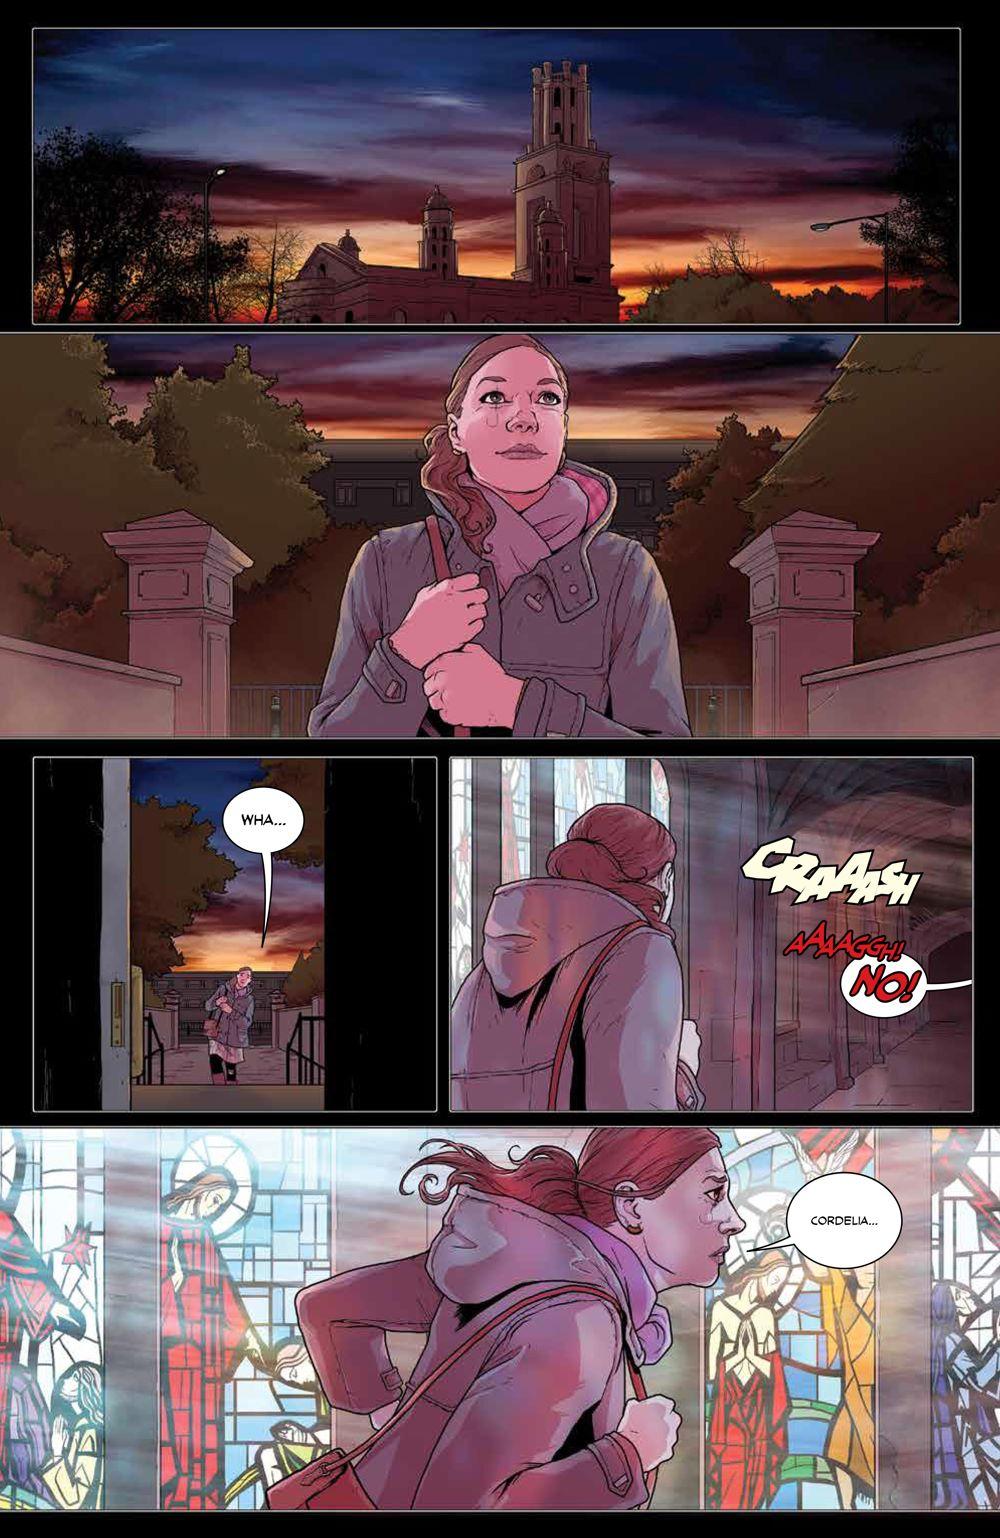 RedMother_v3_SC_PRESS_10 ComicList Previews: RED MOTHER VOLUME 3 TP